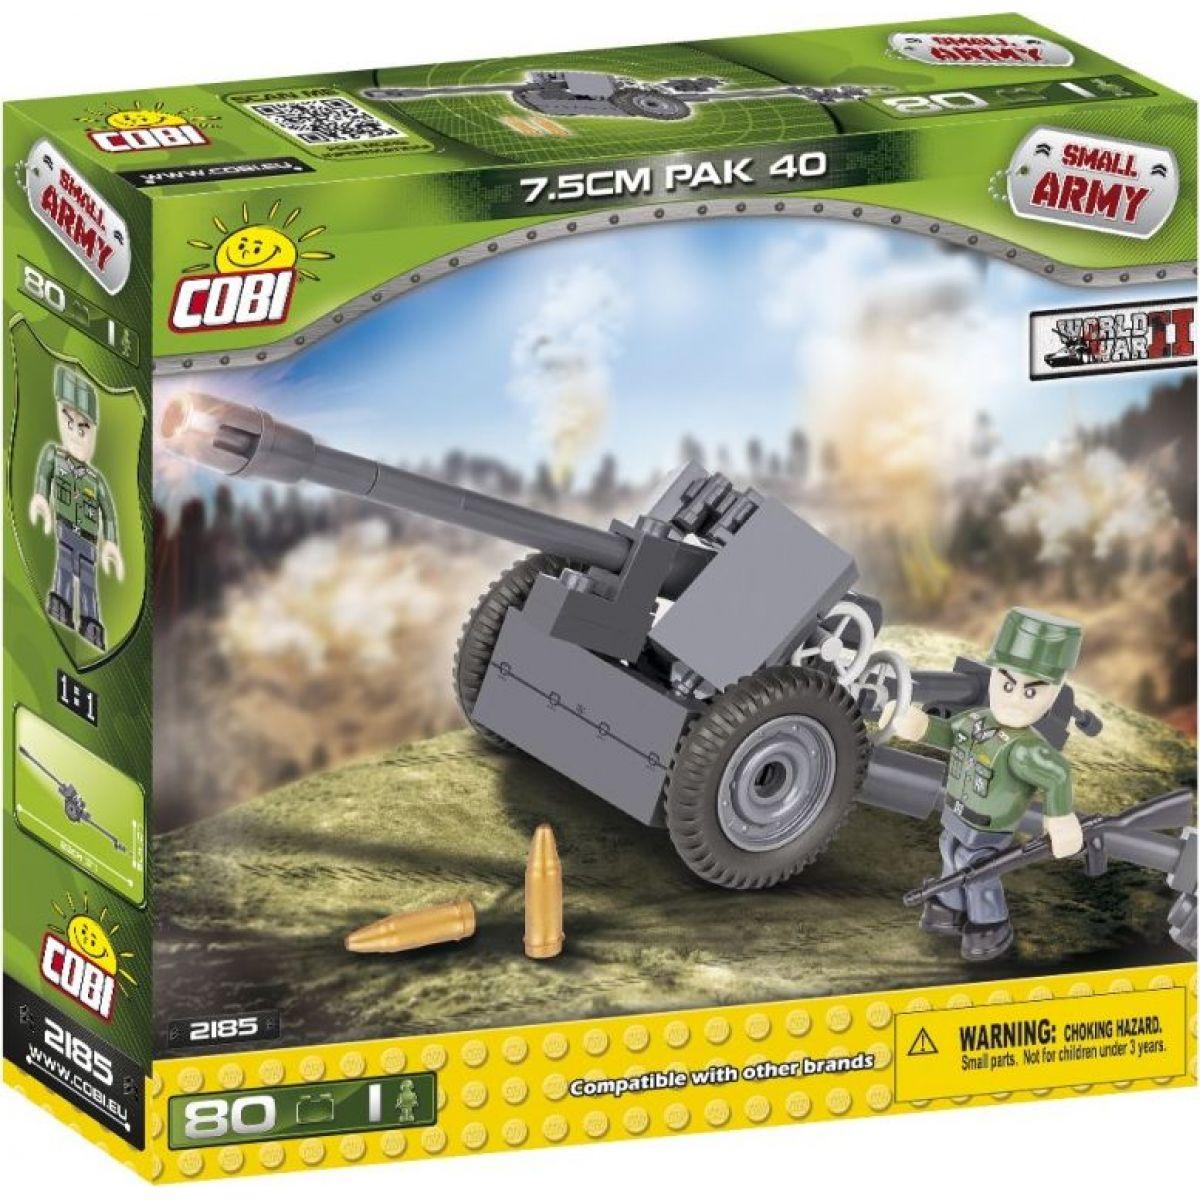 COBI 2185 II WW PaK 40 Panzerabwehrkanone 3 7,5 cm 80 k 1 f